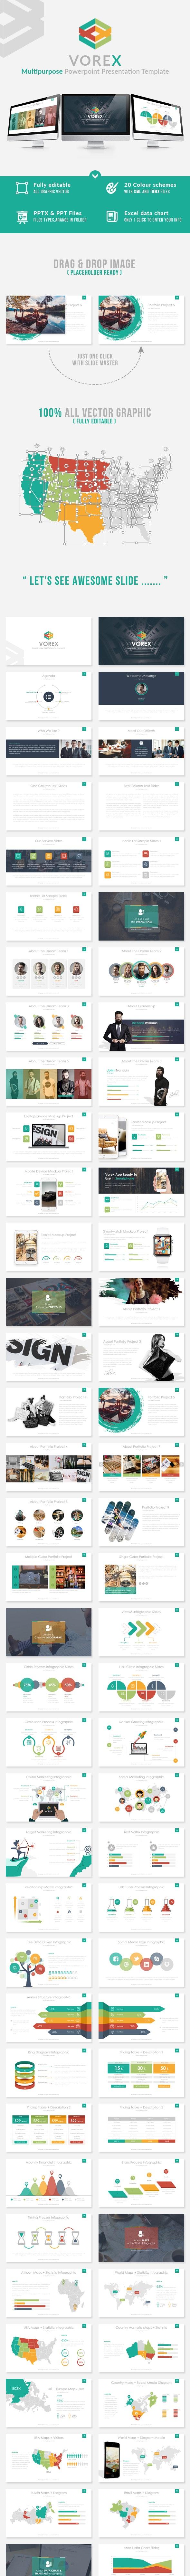 Vorex - Multipurpose Powerpoint Presentation Template - Business PowerPoint Templates